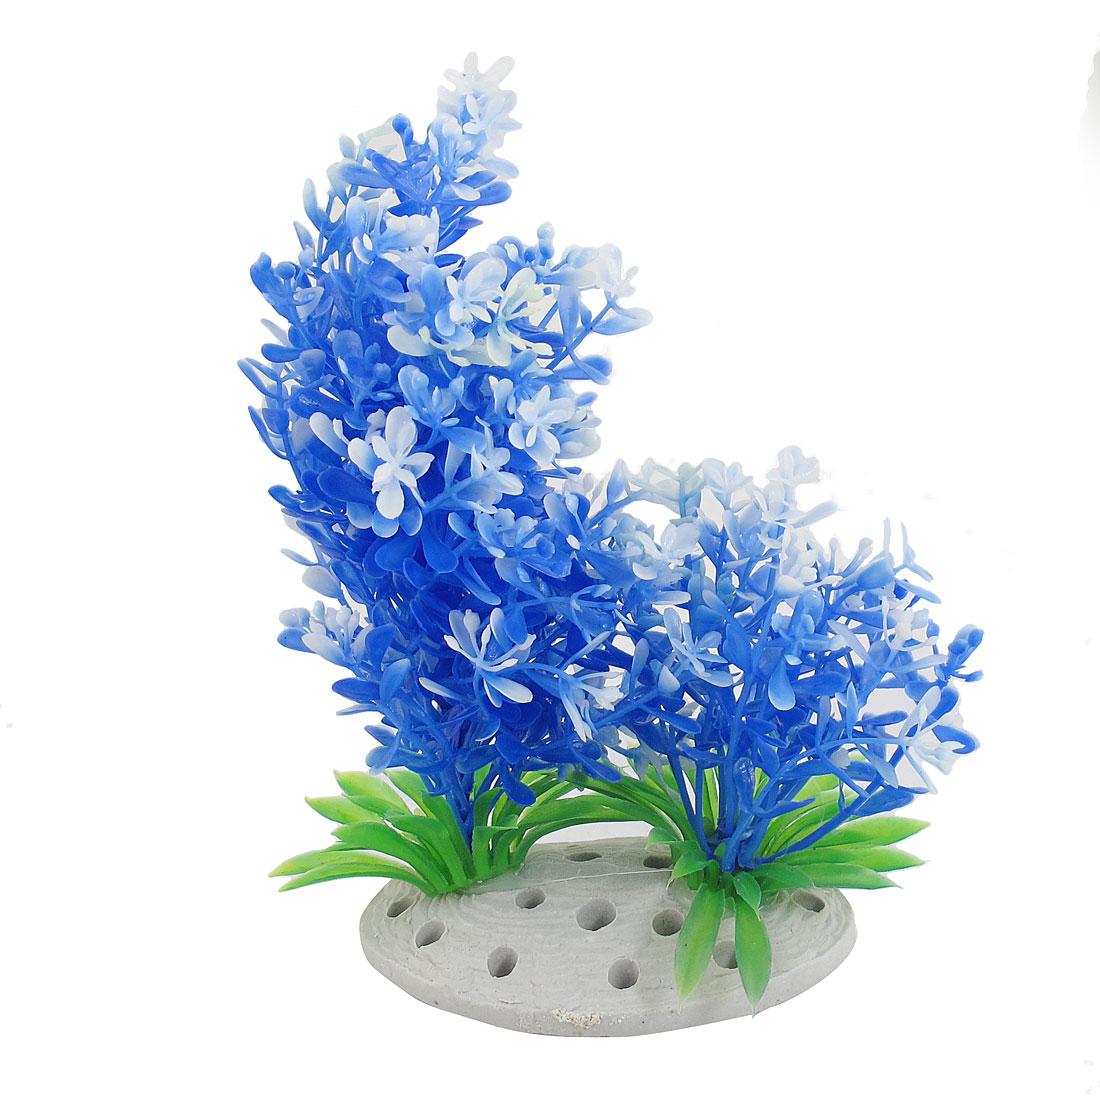 "7.3"" Height Landscaping Plastic Colorful Plants Aquarium Aquascaping Tank Decor"